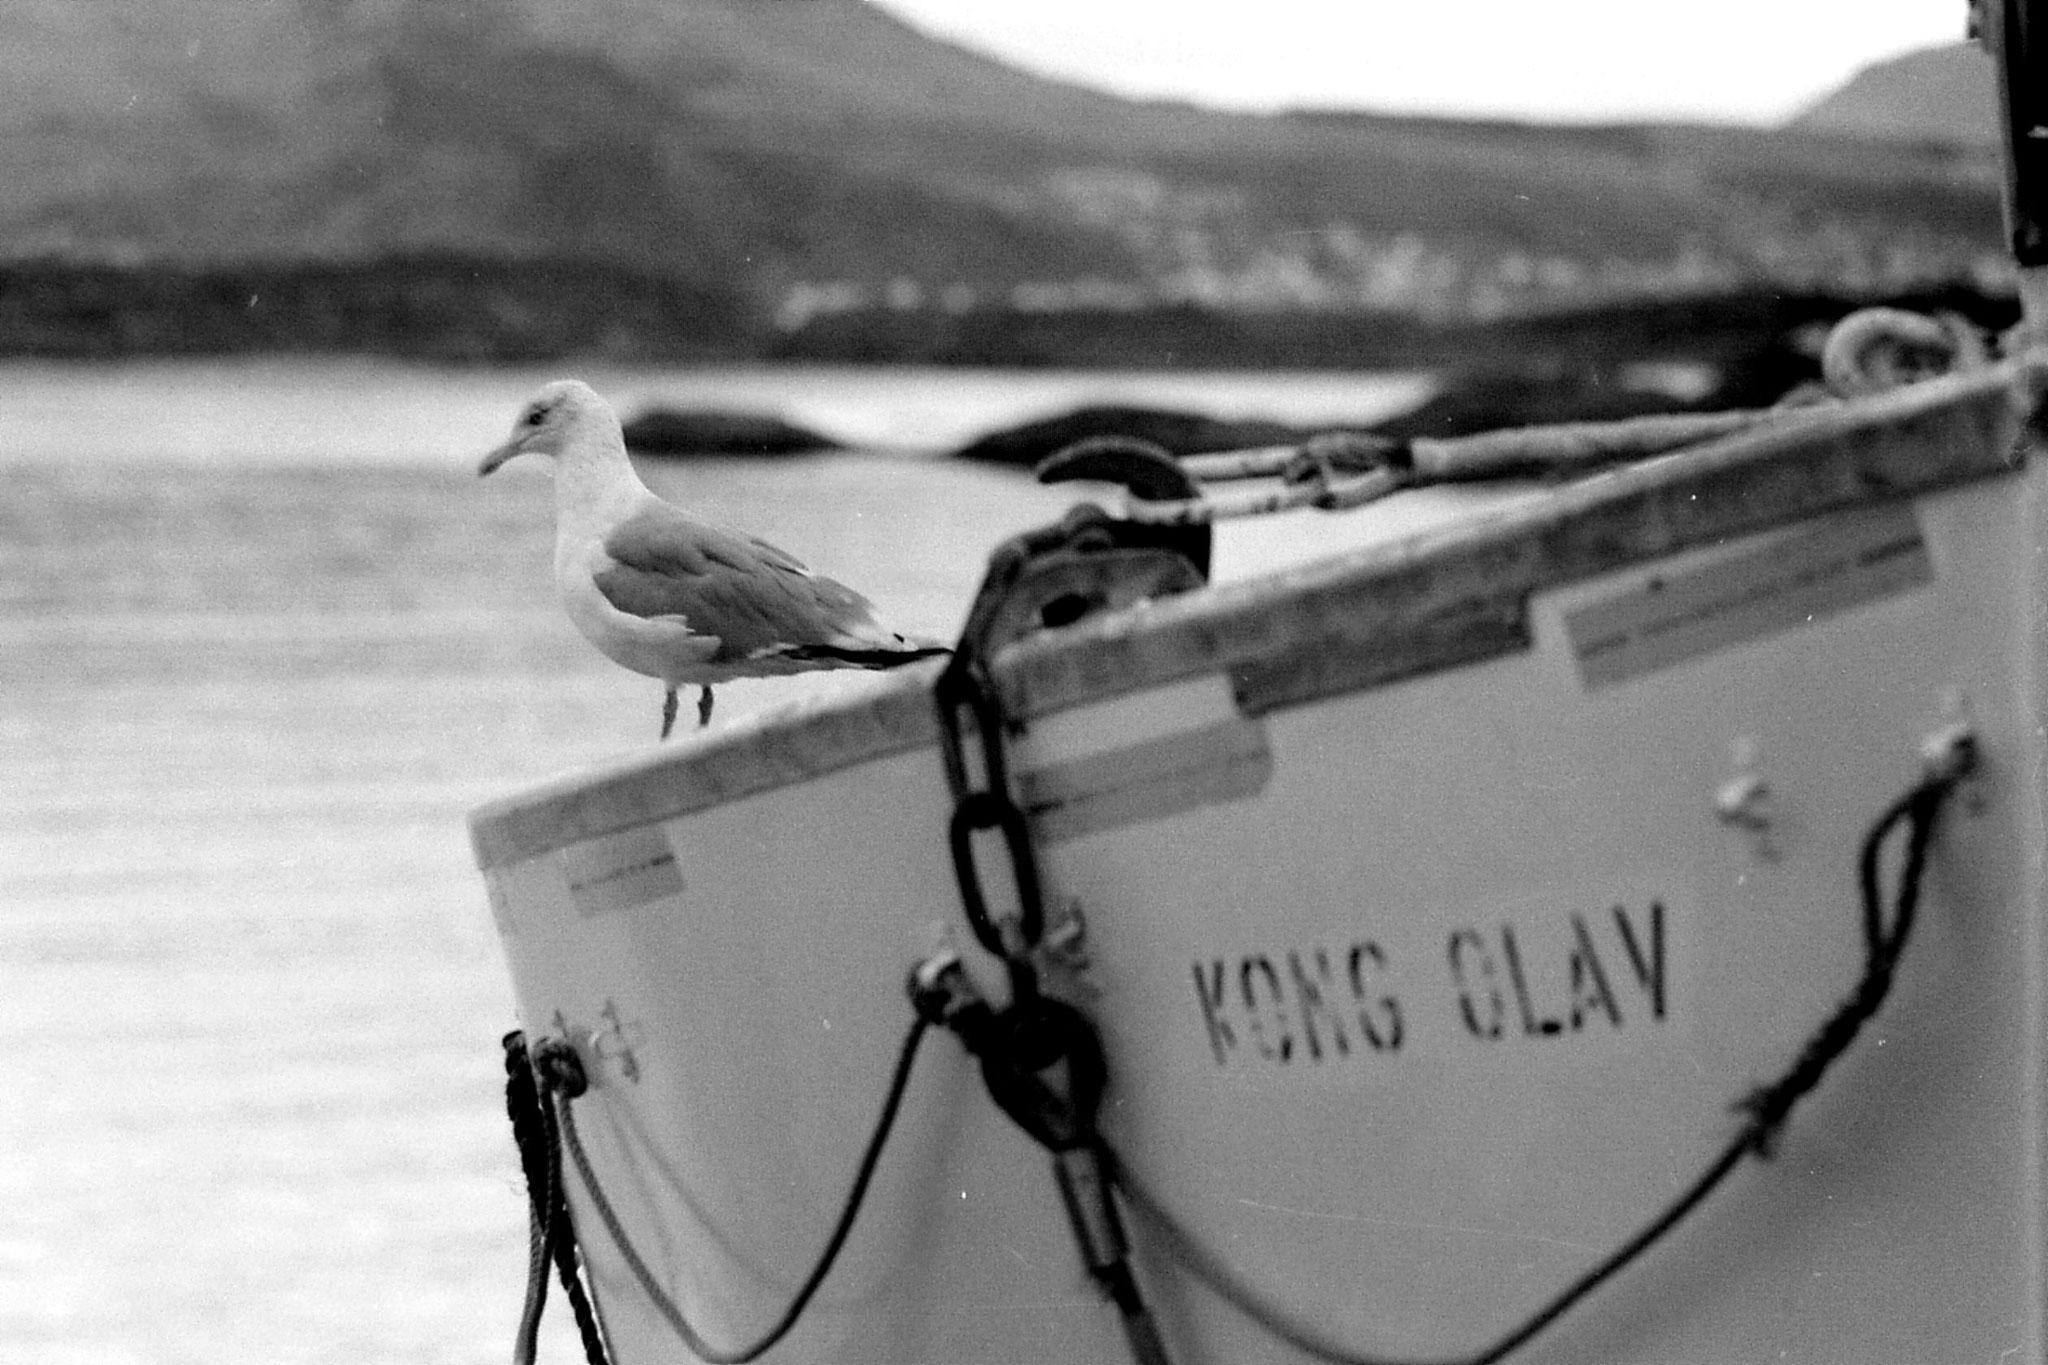 29: seagull